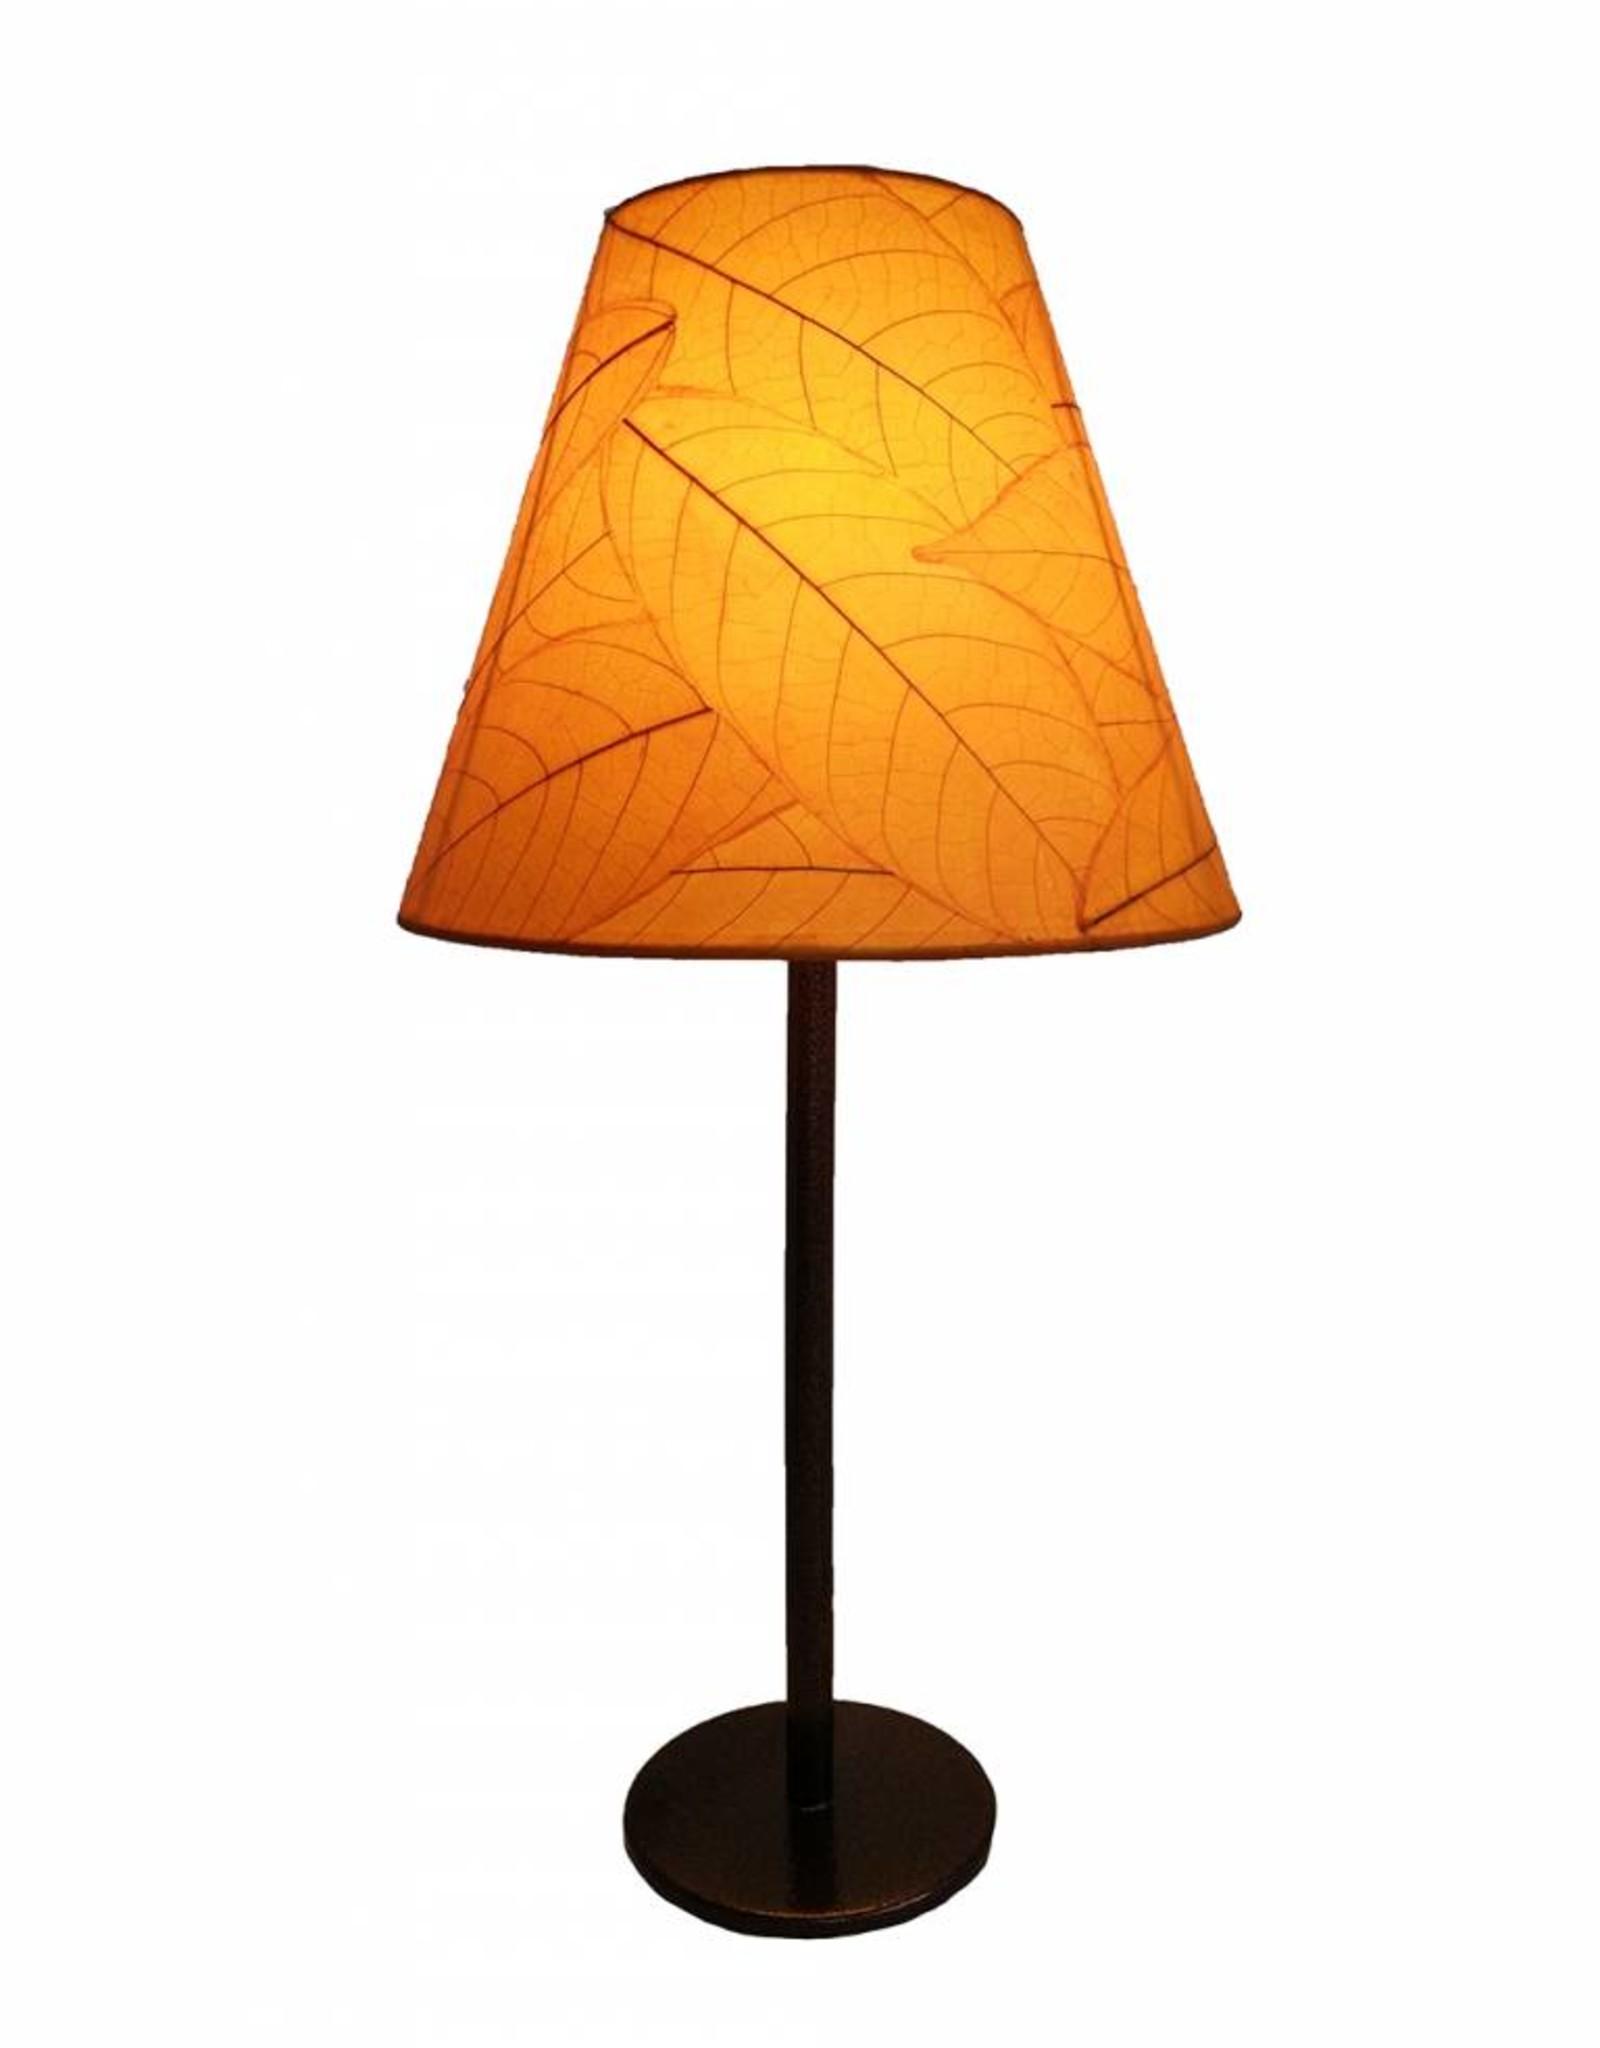 Eangee Outdoor Mushroom Table Lamp +6 Colors